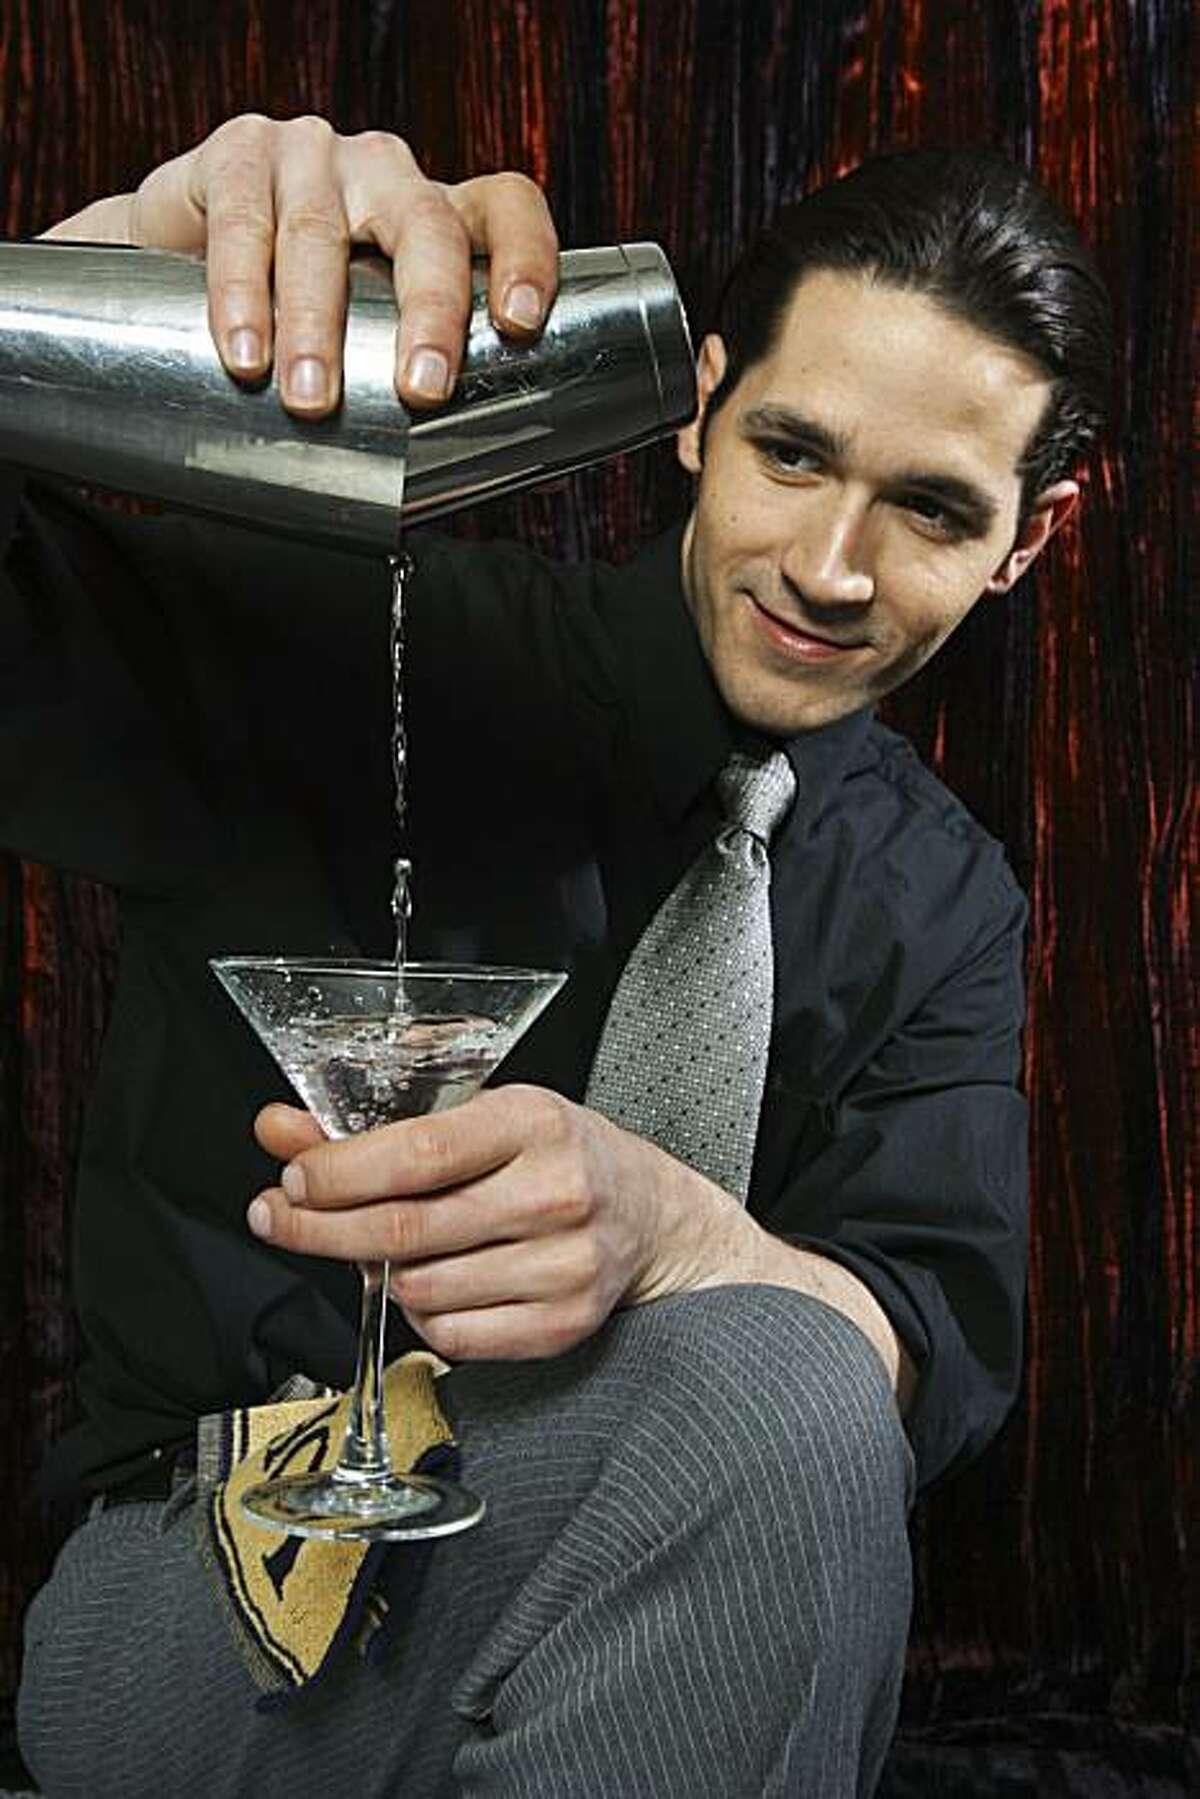 Bartender at work making a martini